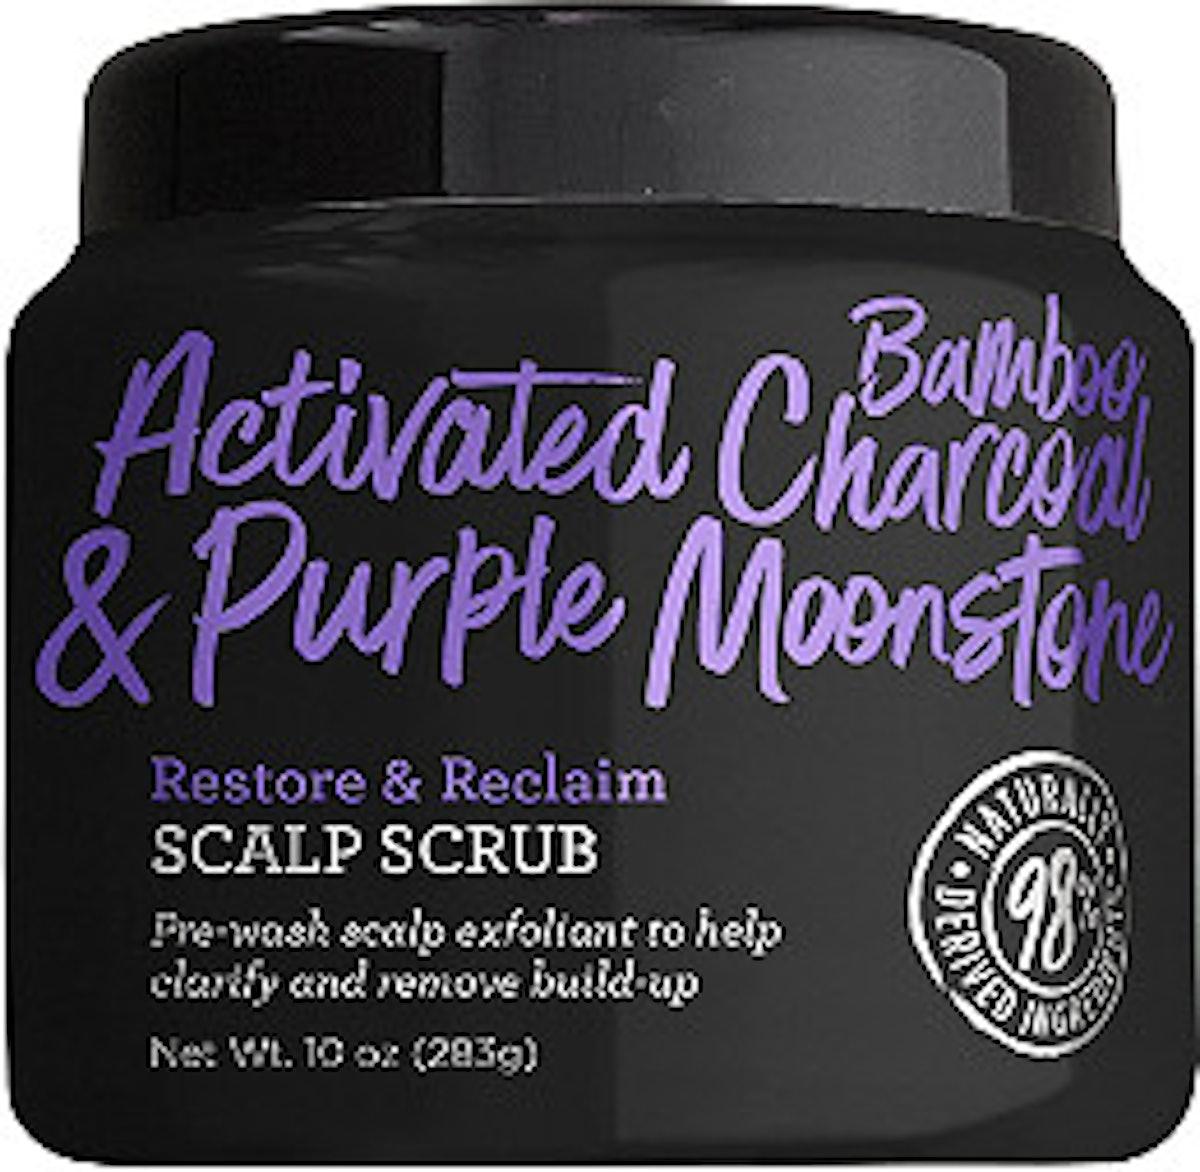 Activated Bamboo Charcoal & Purple Moonstone Restore & Reclaim Scalp Scrub